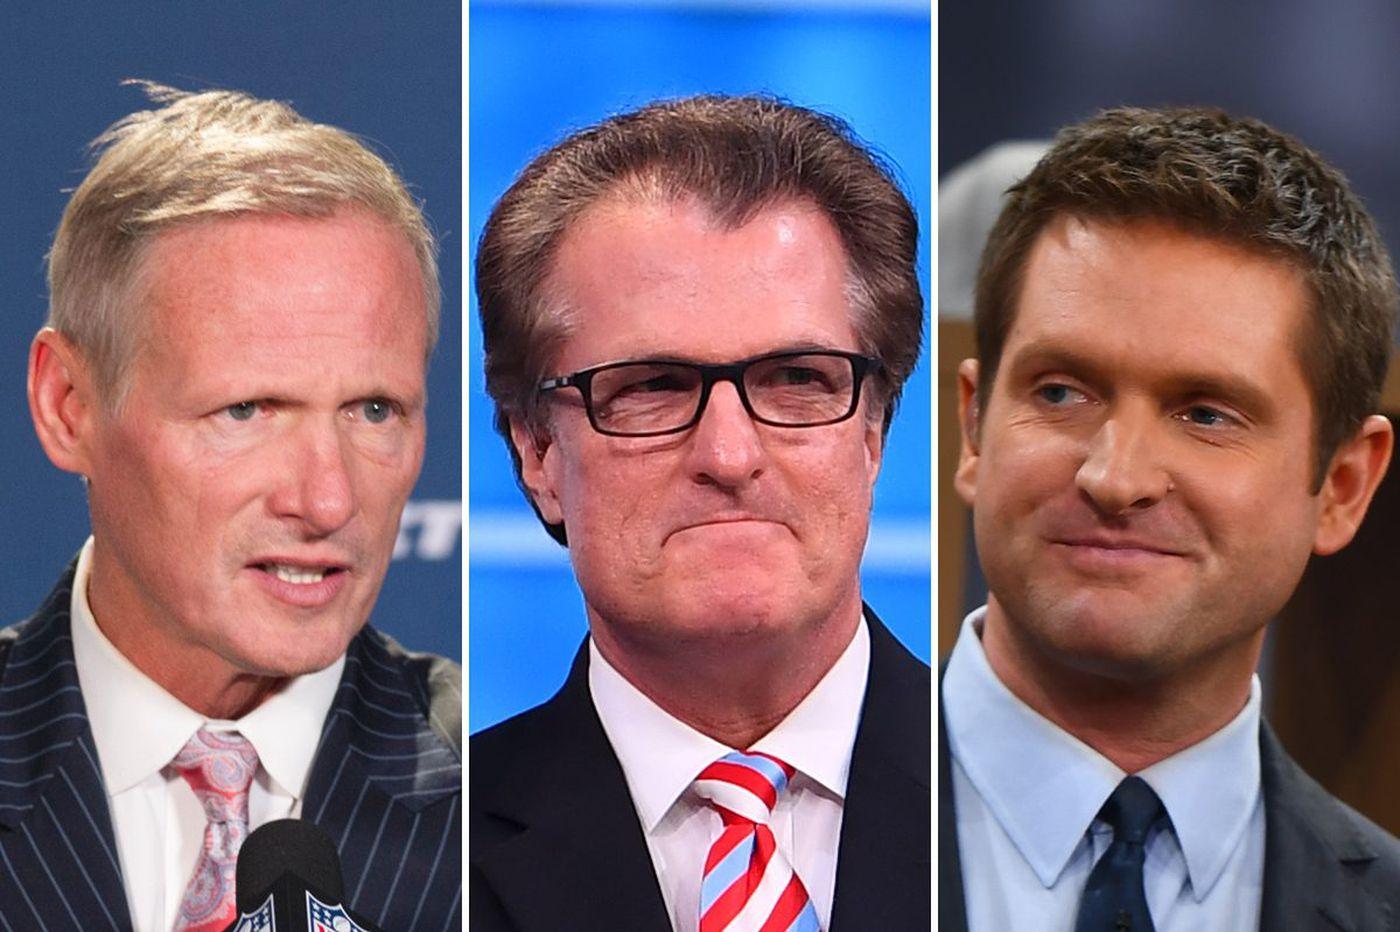 NFL draft 2018: How many picks did Mel Kiper, Mike Mayock and Todd McShay actually get right?